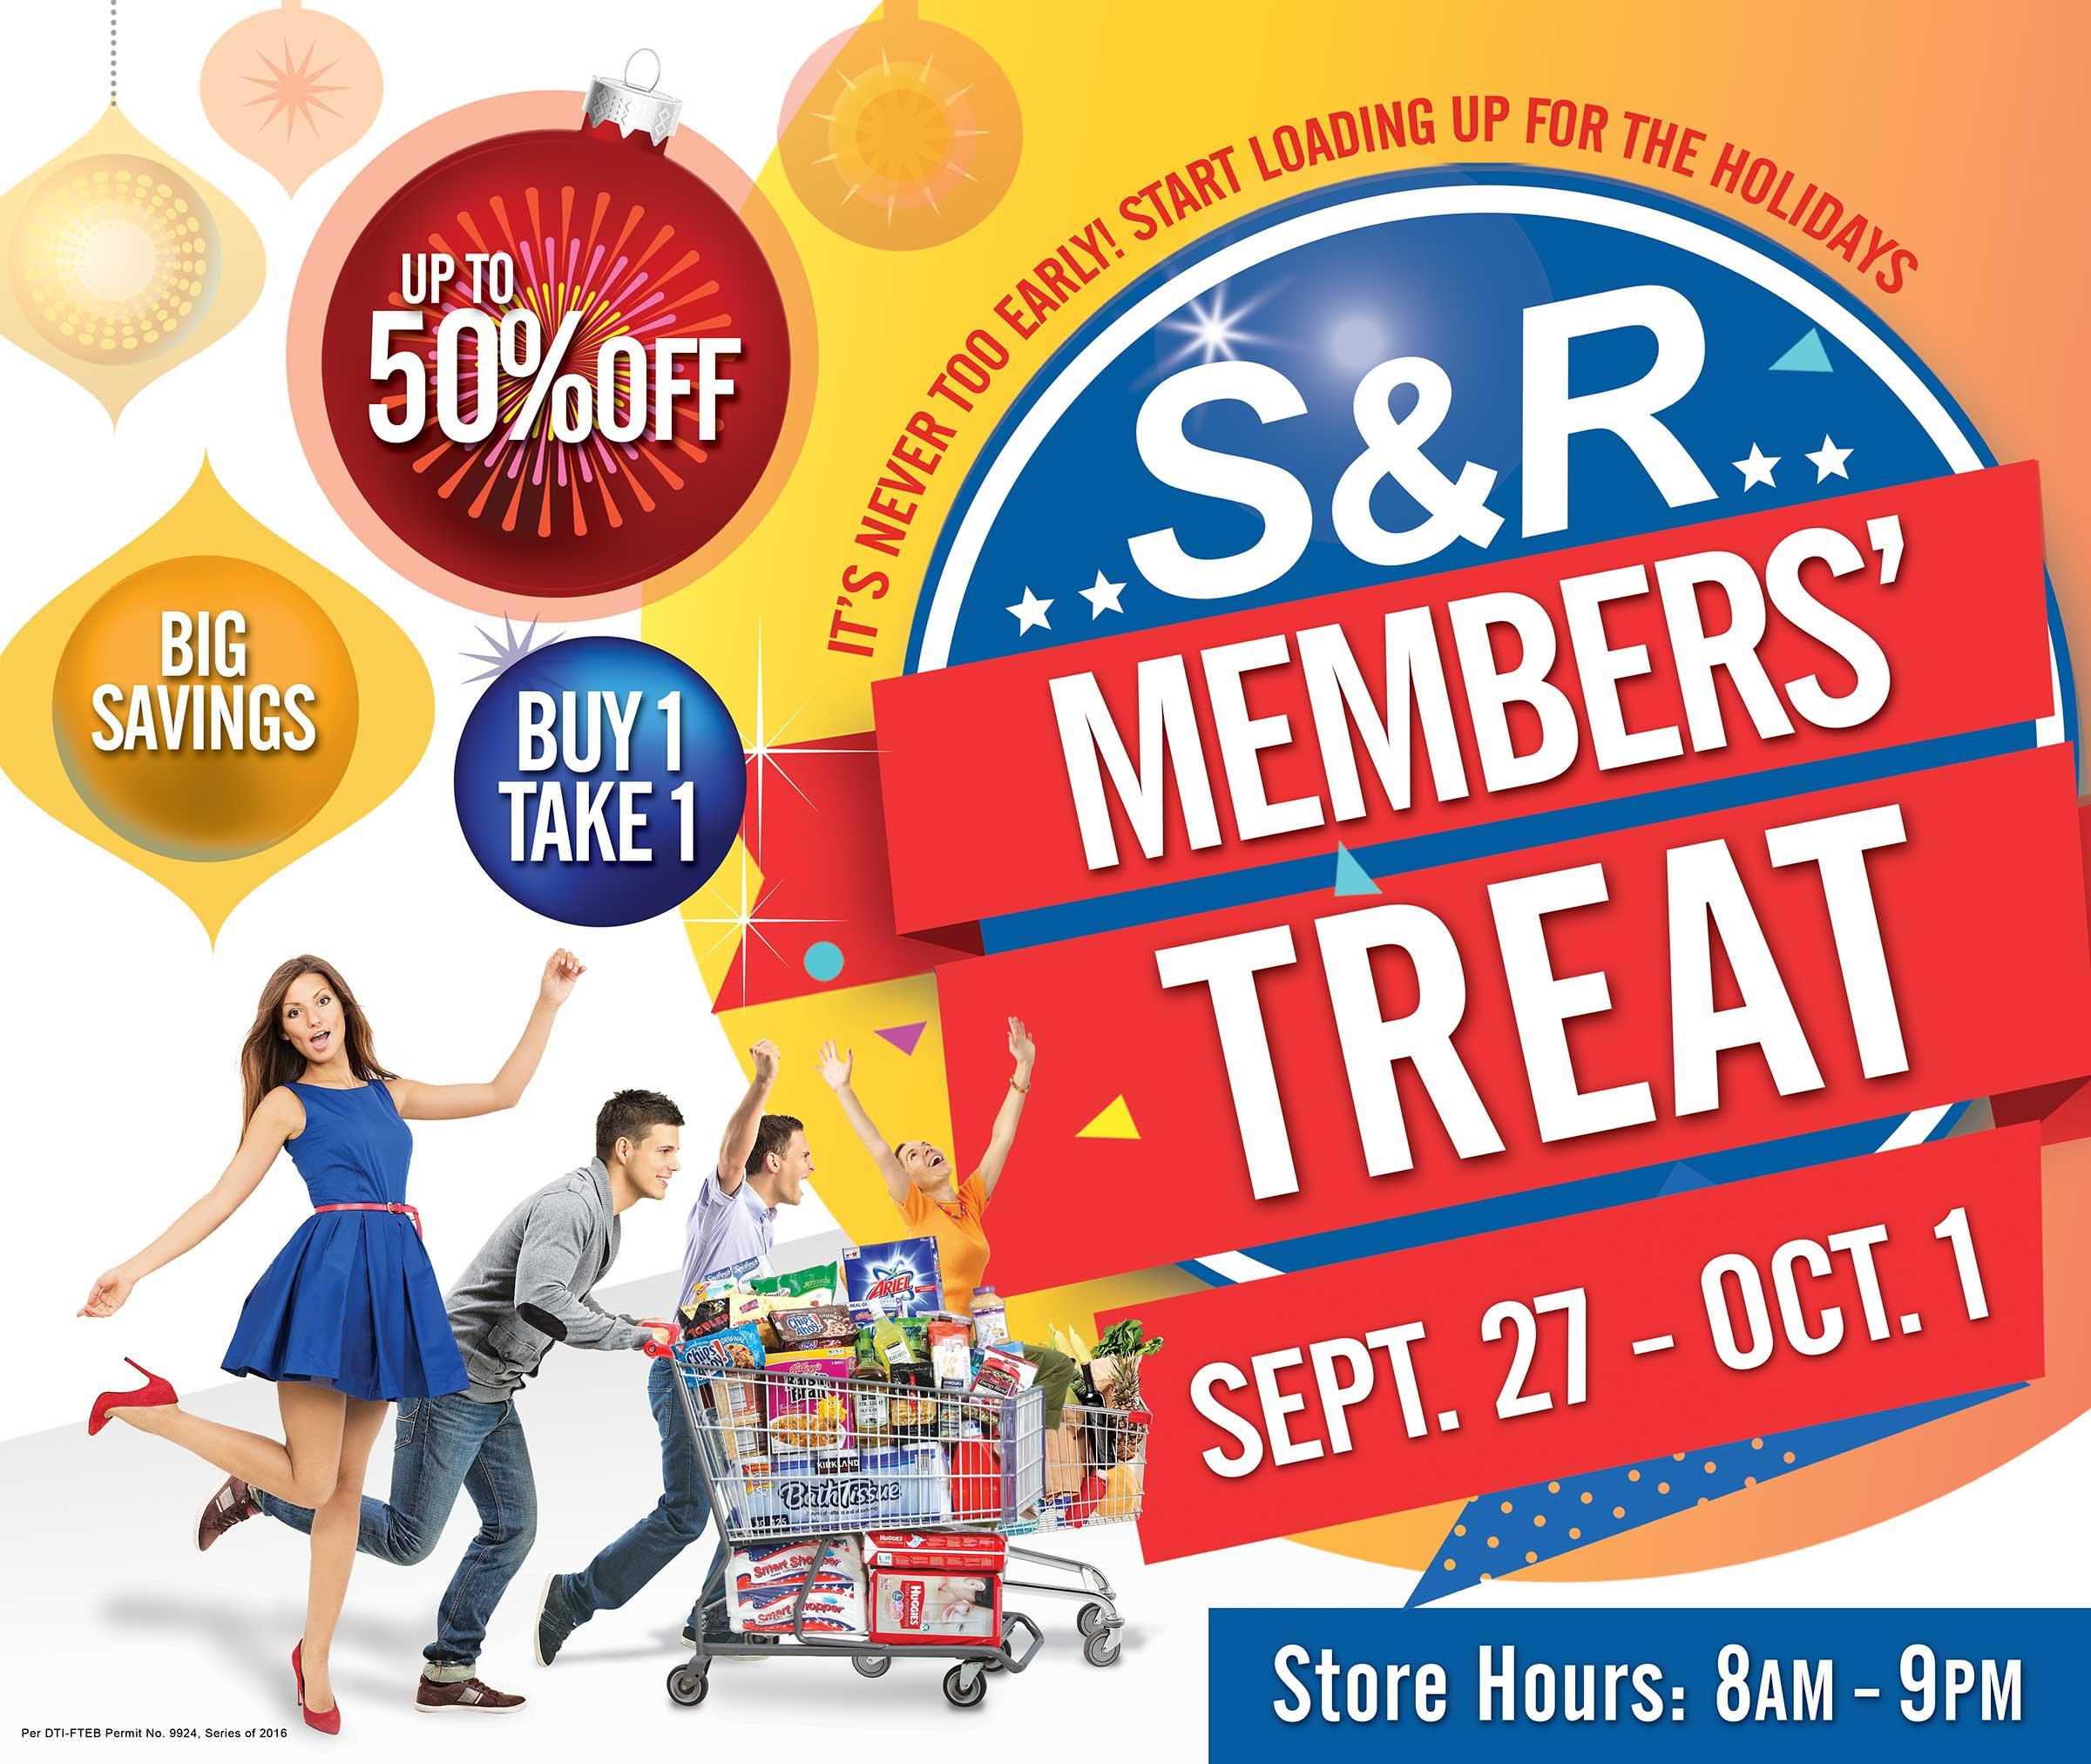 s&r members' treat sale cdo